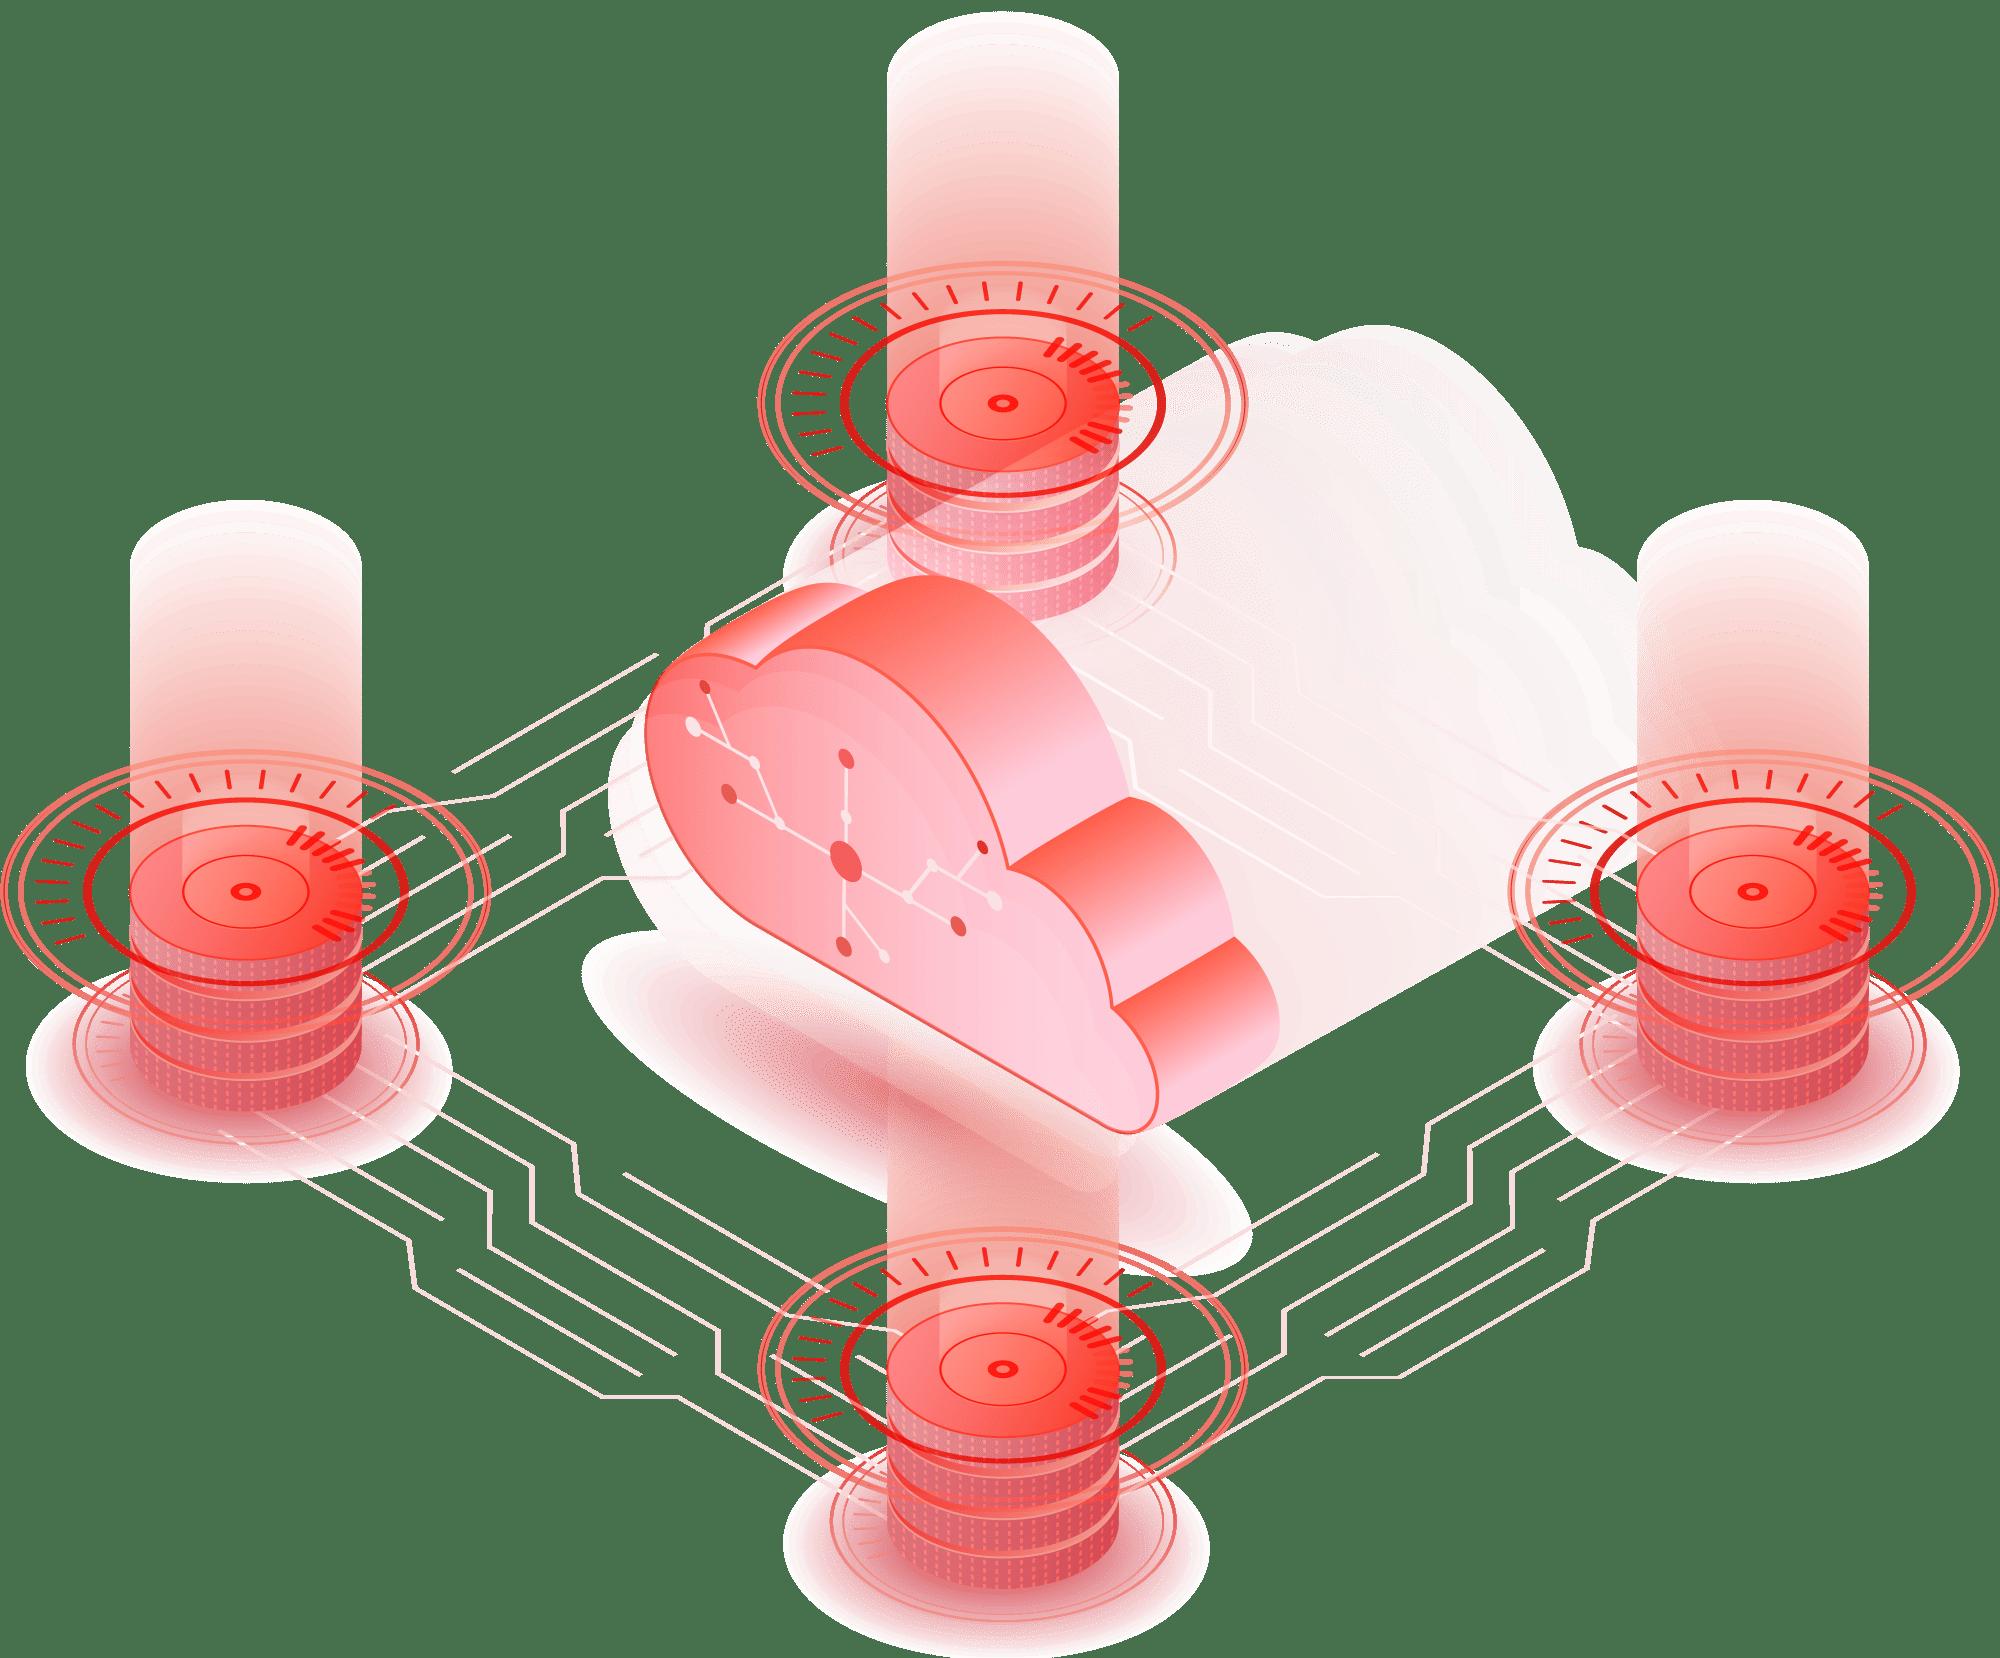 kopfmedia-werbeagentur-offenburg-cloud-storage